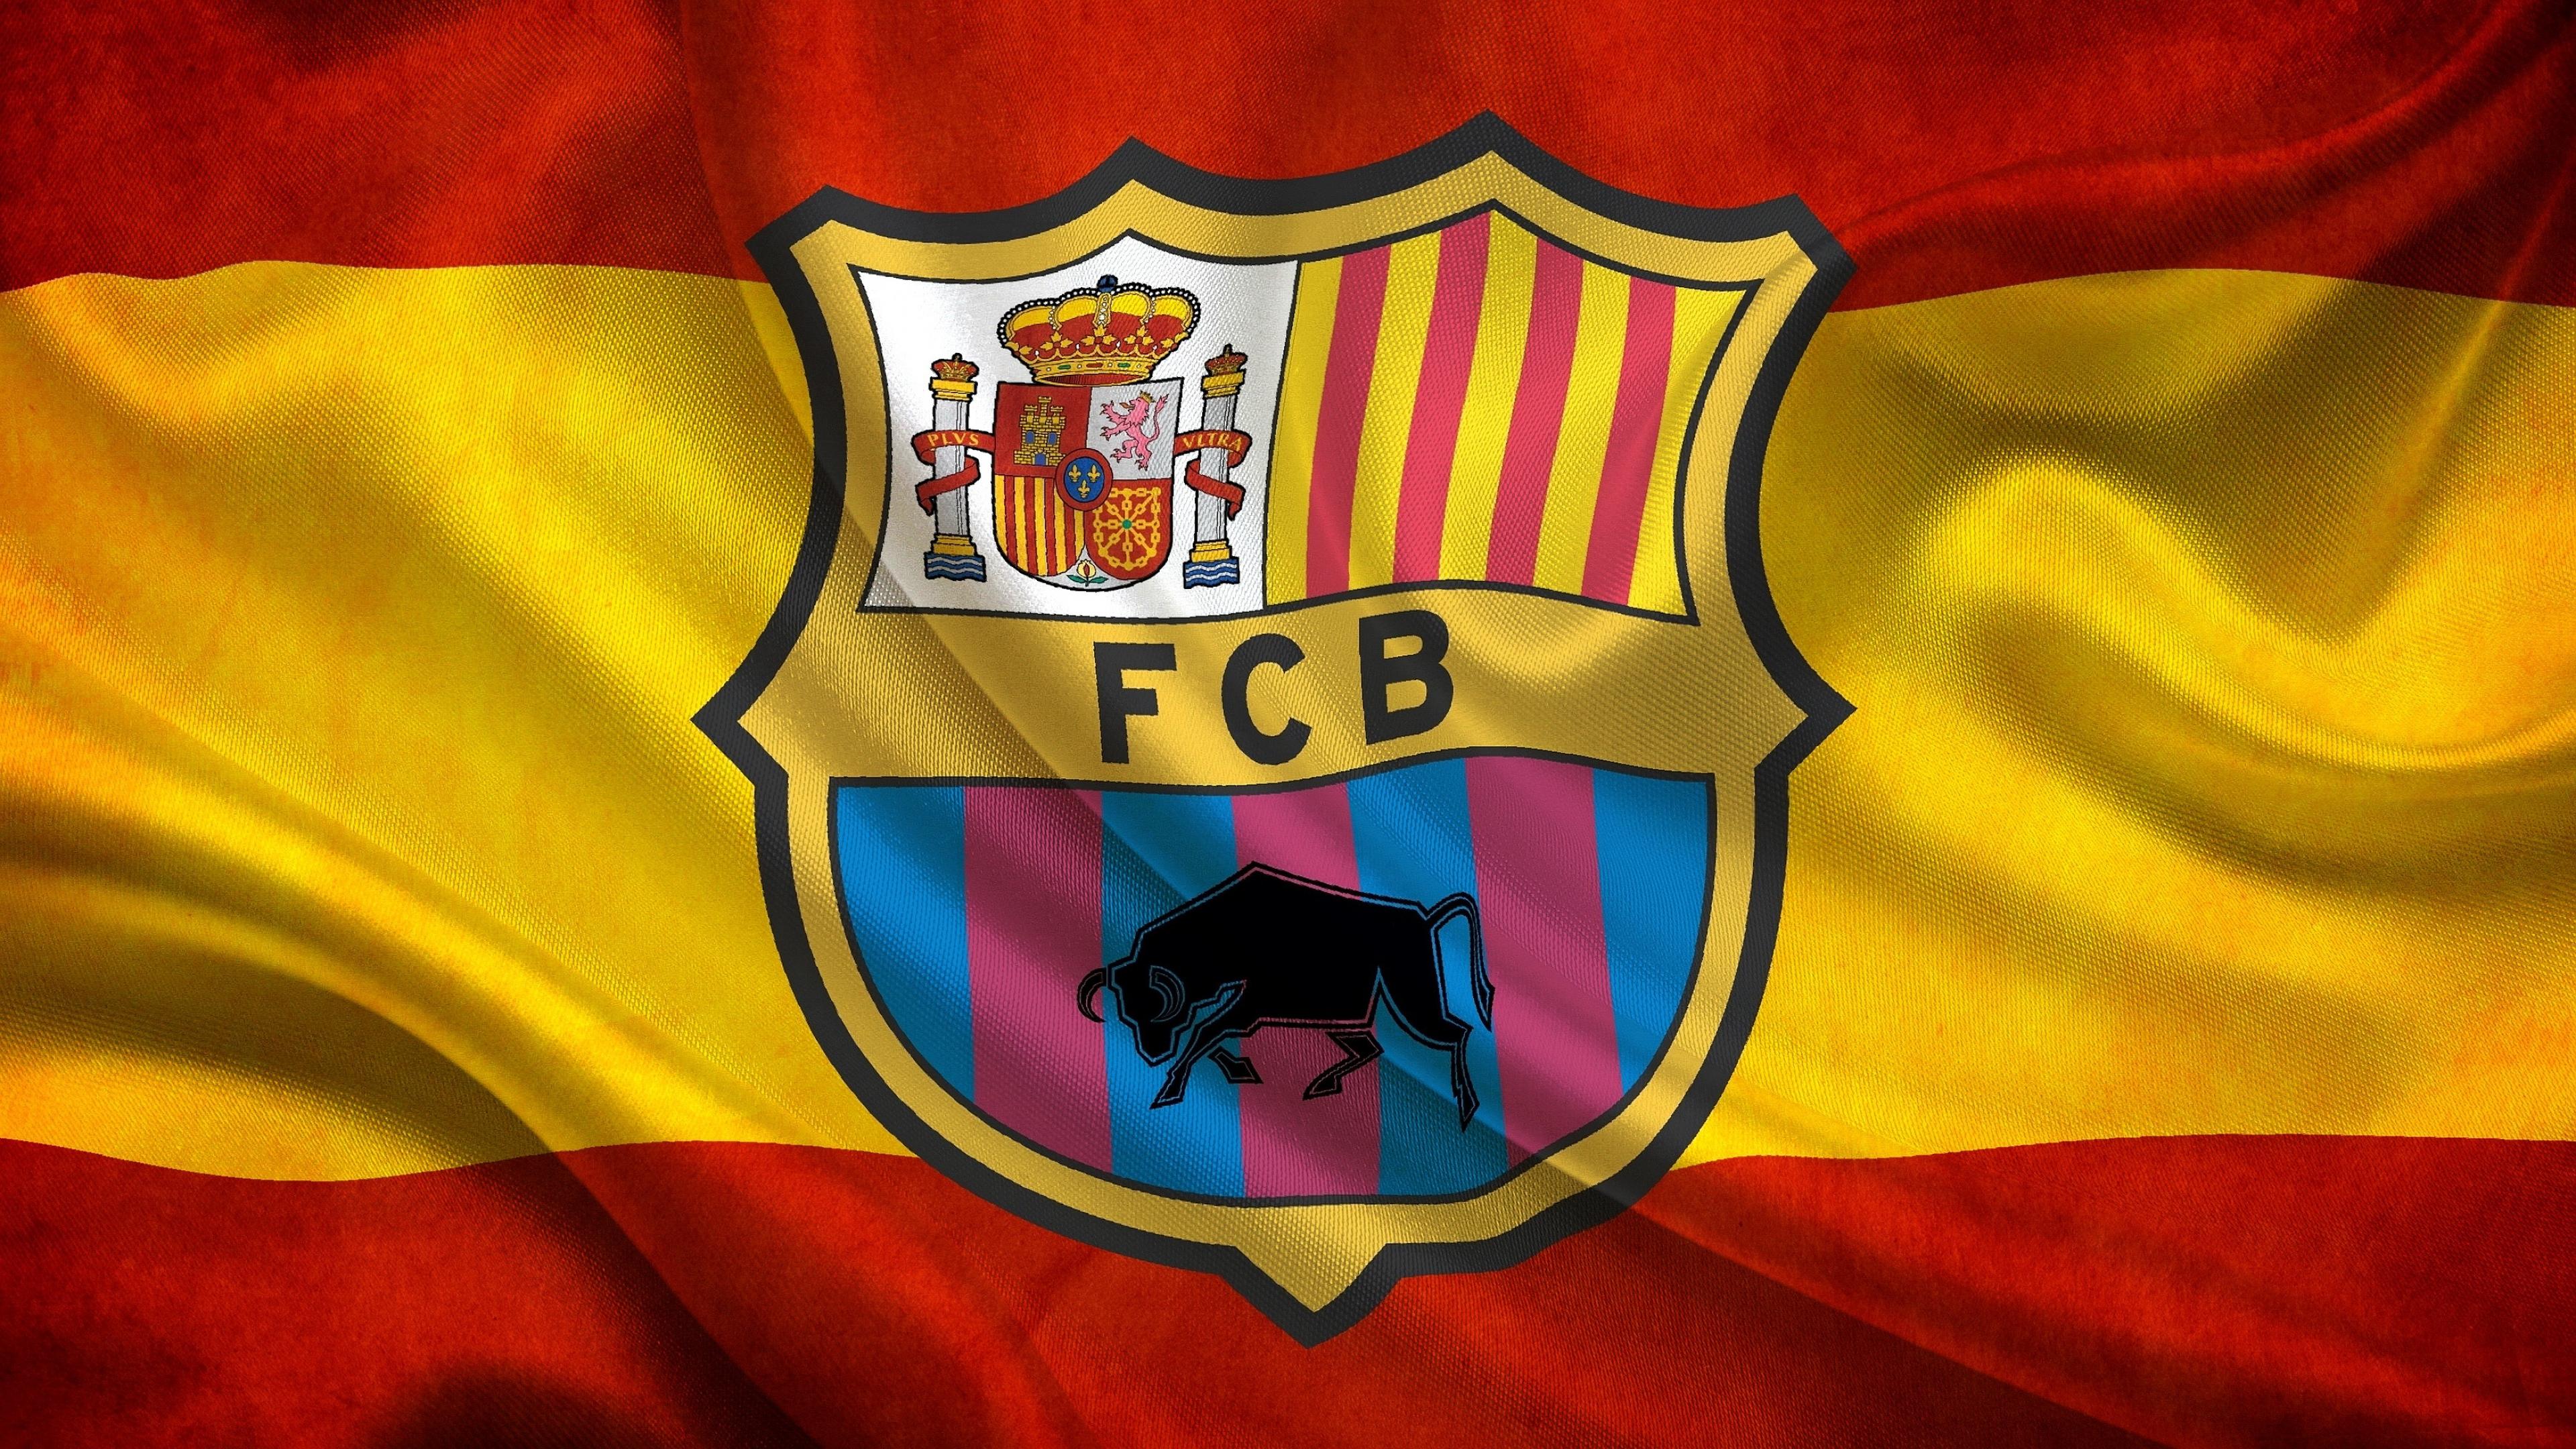 Fc Barcelona Flag Ipad Pro Retina Display